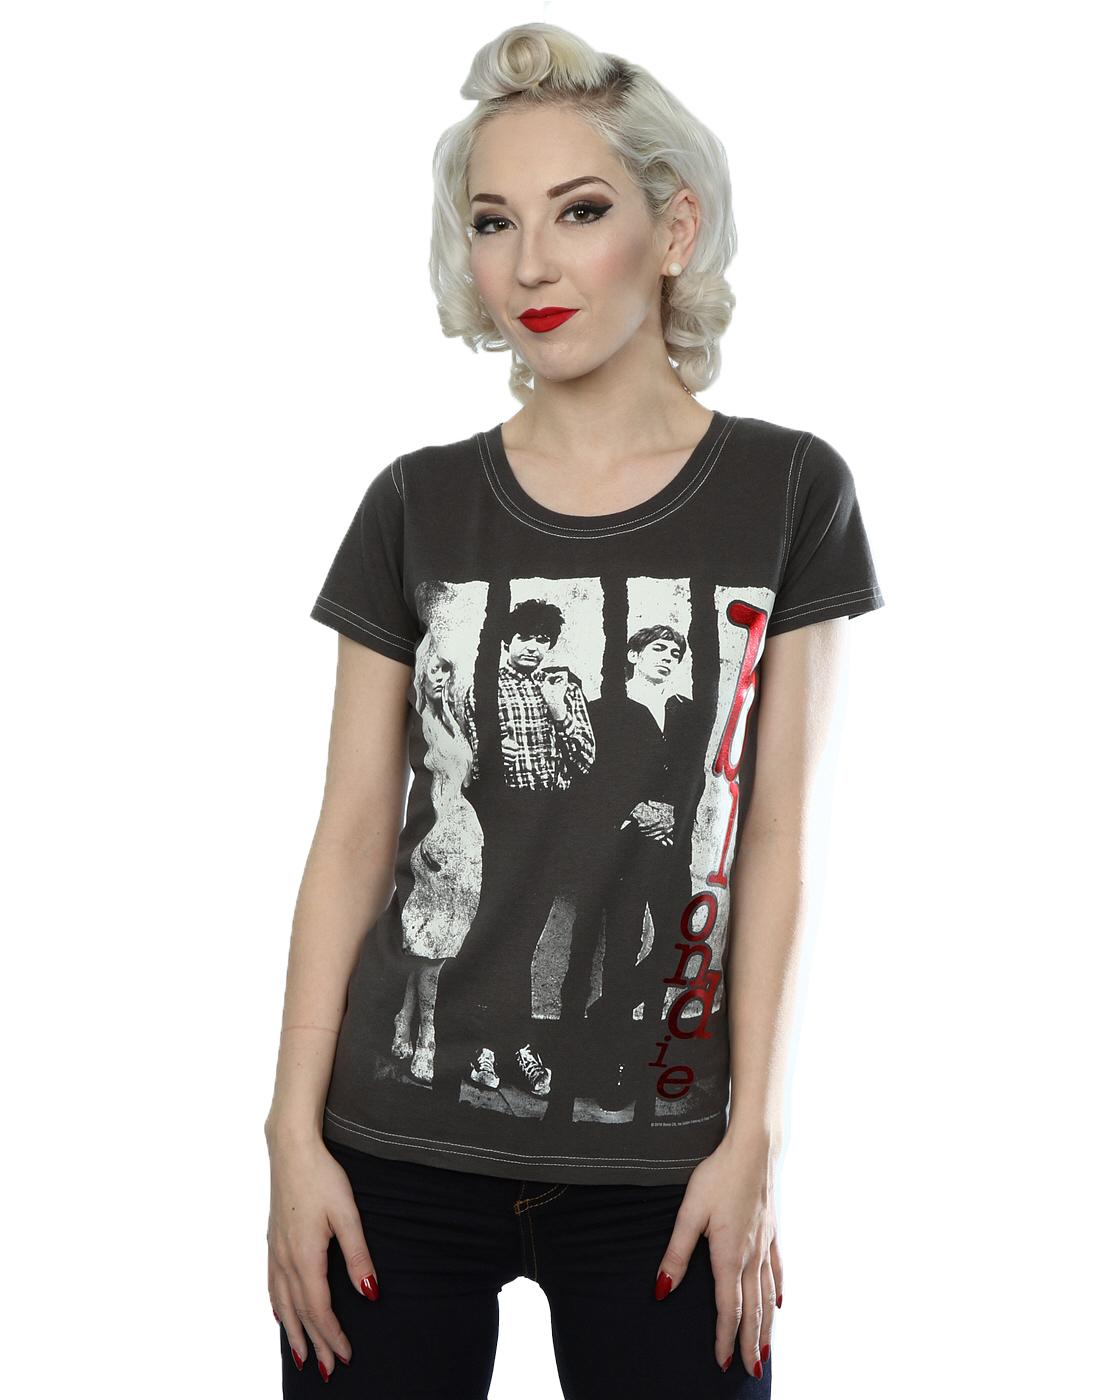 Aftershow Women's Blondie Metallic Red Text T-Shirt